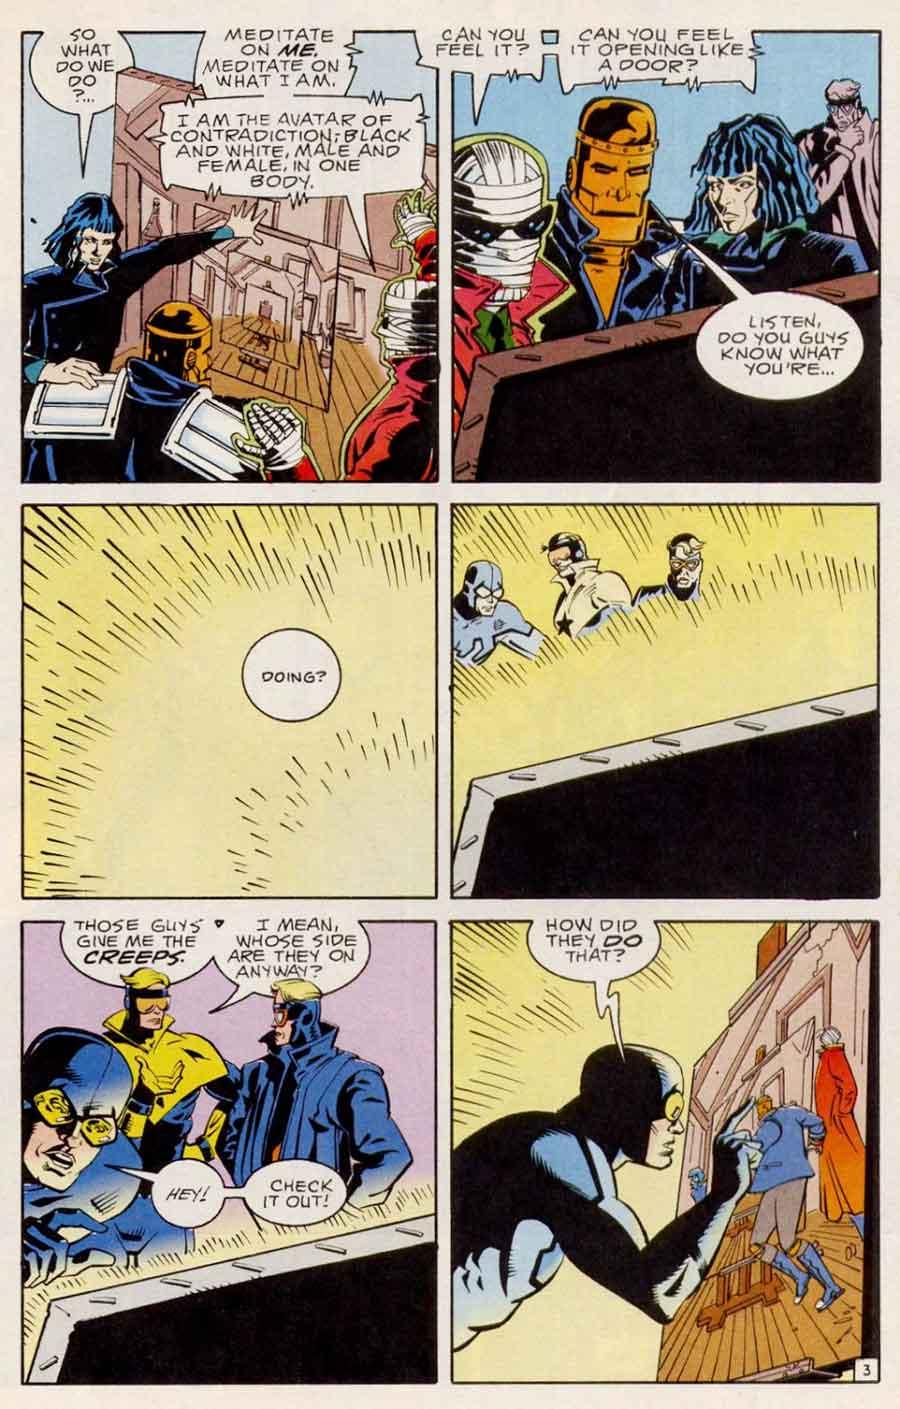 Doom Patrol #28 by Grant Morrison, Richard Case and John Nyberg